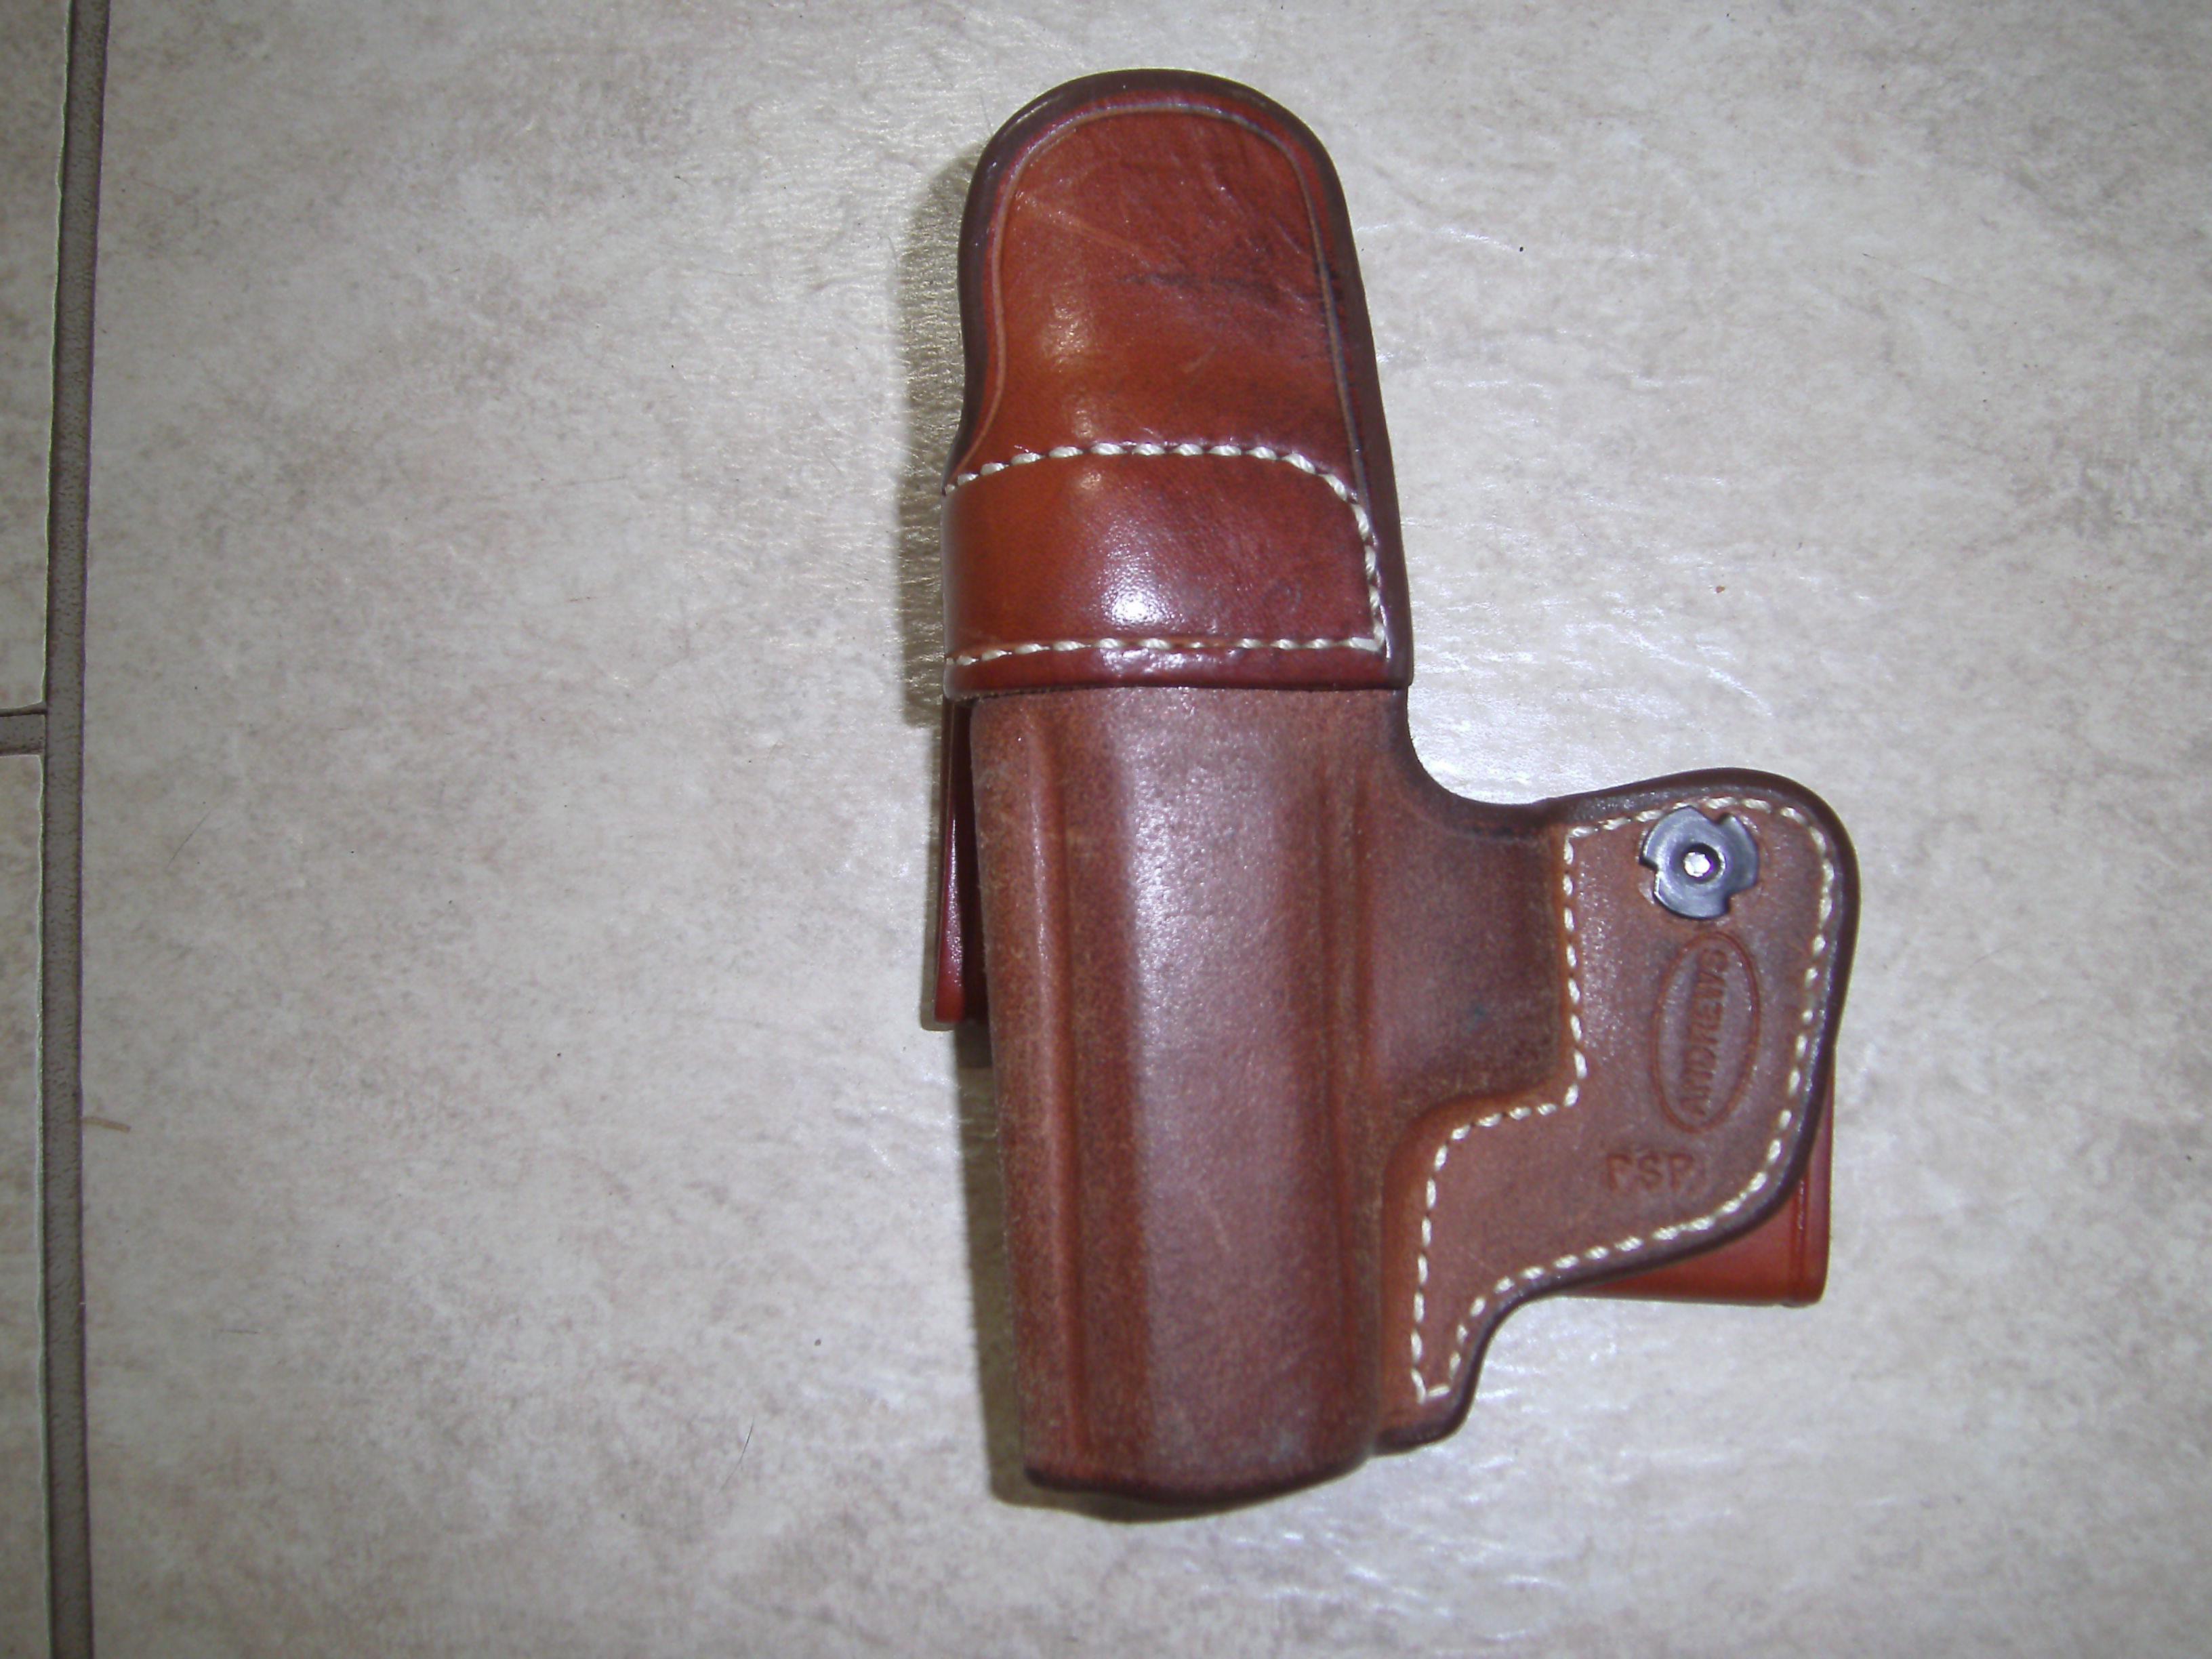 P7 PSP Gunleather for sale-sany1665.jpg